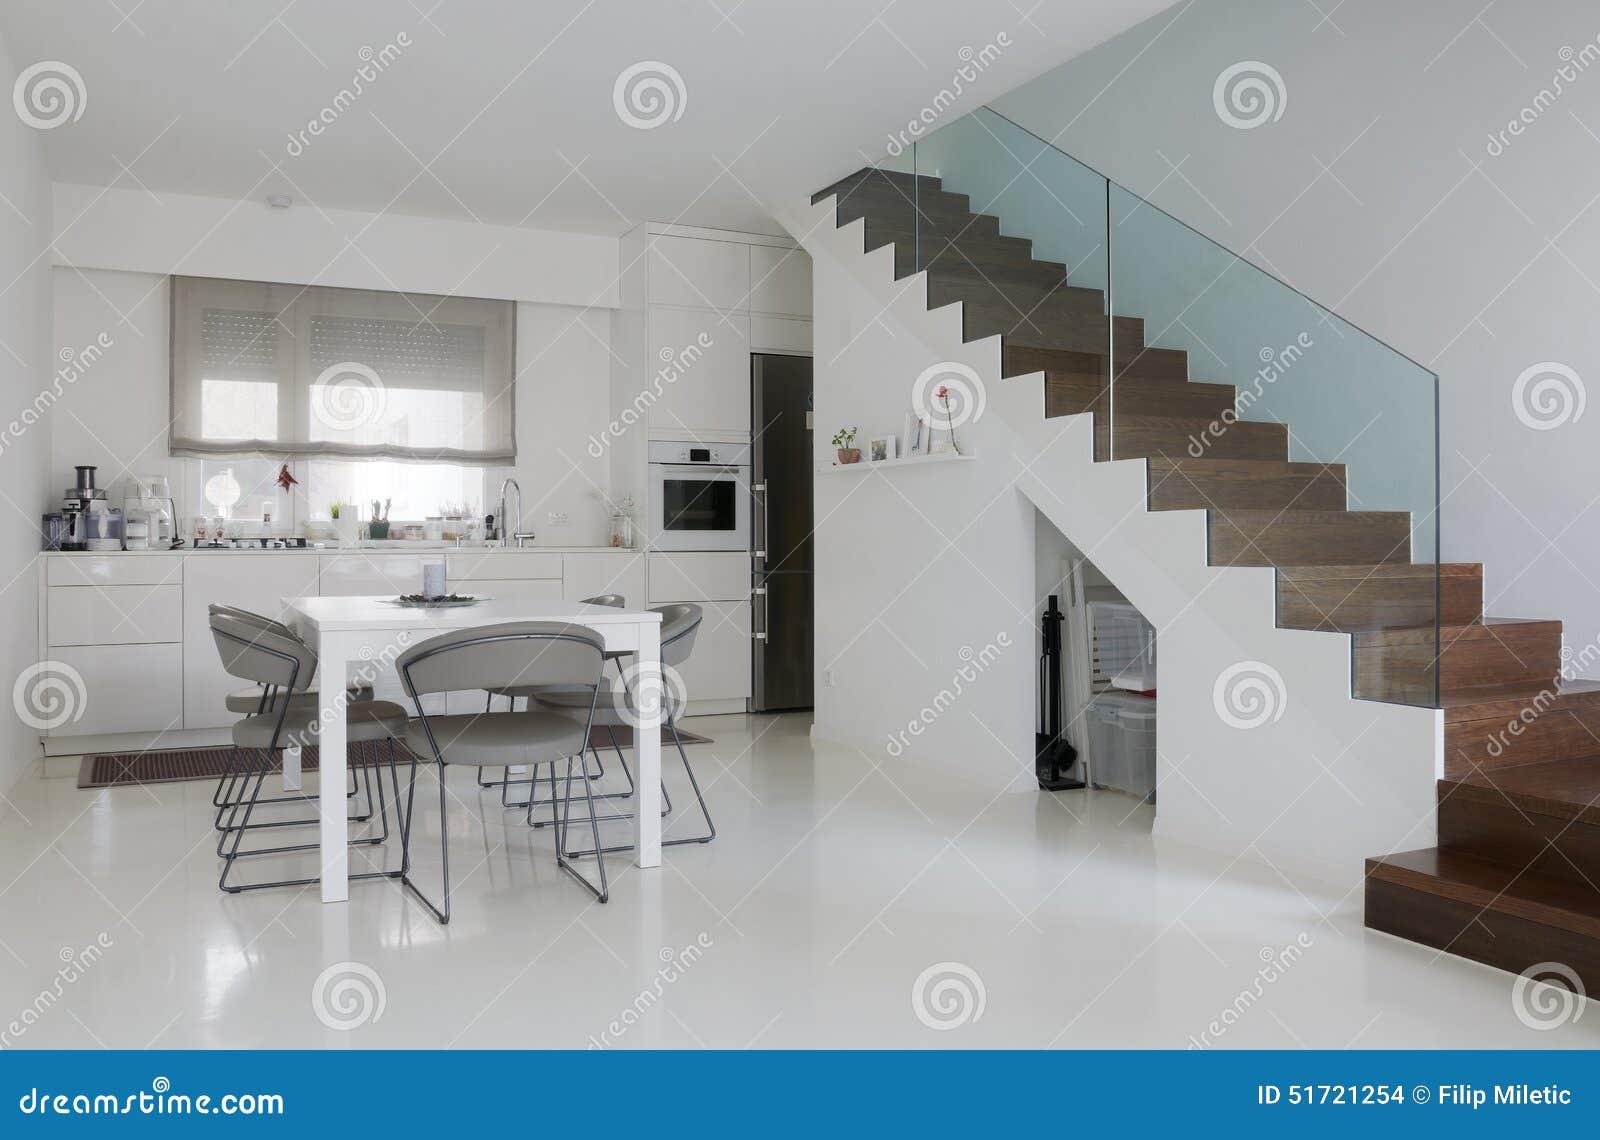 cuisine blanche et salle manger photo stock image. Black Bedroom Furniture Sets. Home Design Ideas